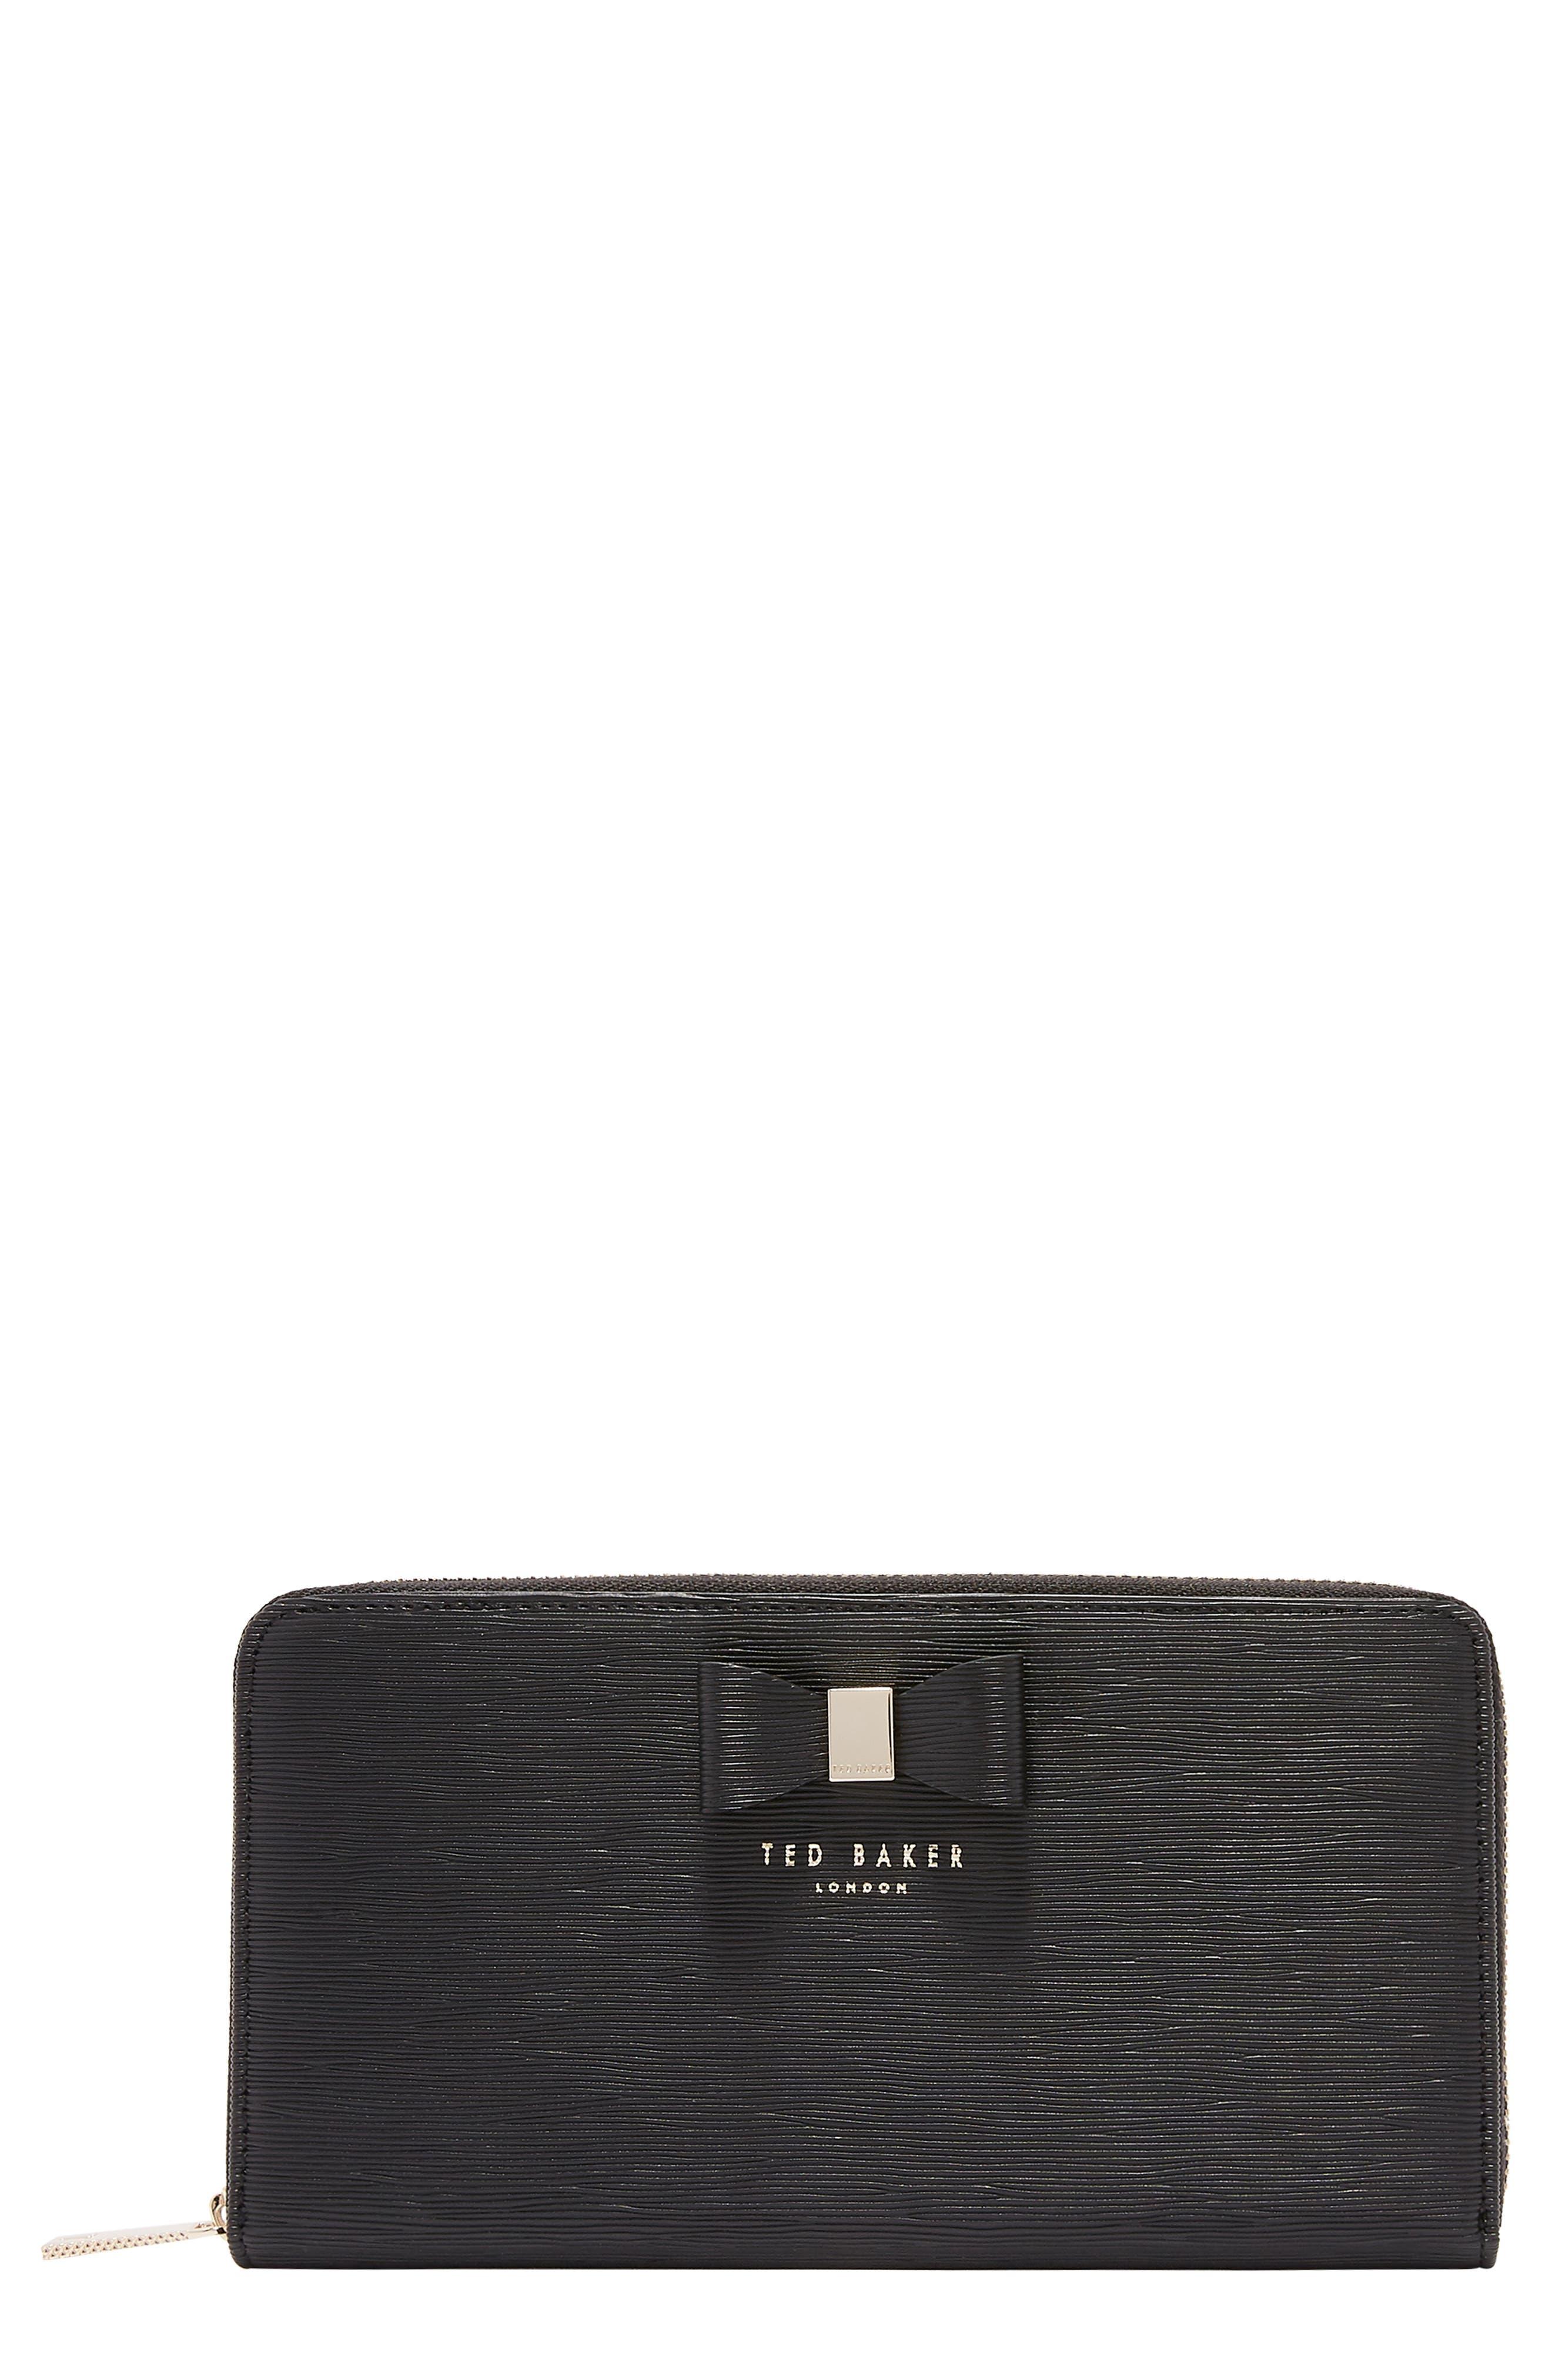 Peony Plissé Leather Matinee Wallet,                             Main thumbnail 1, color,                             001